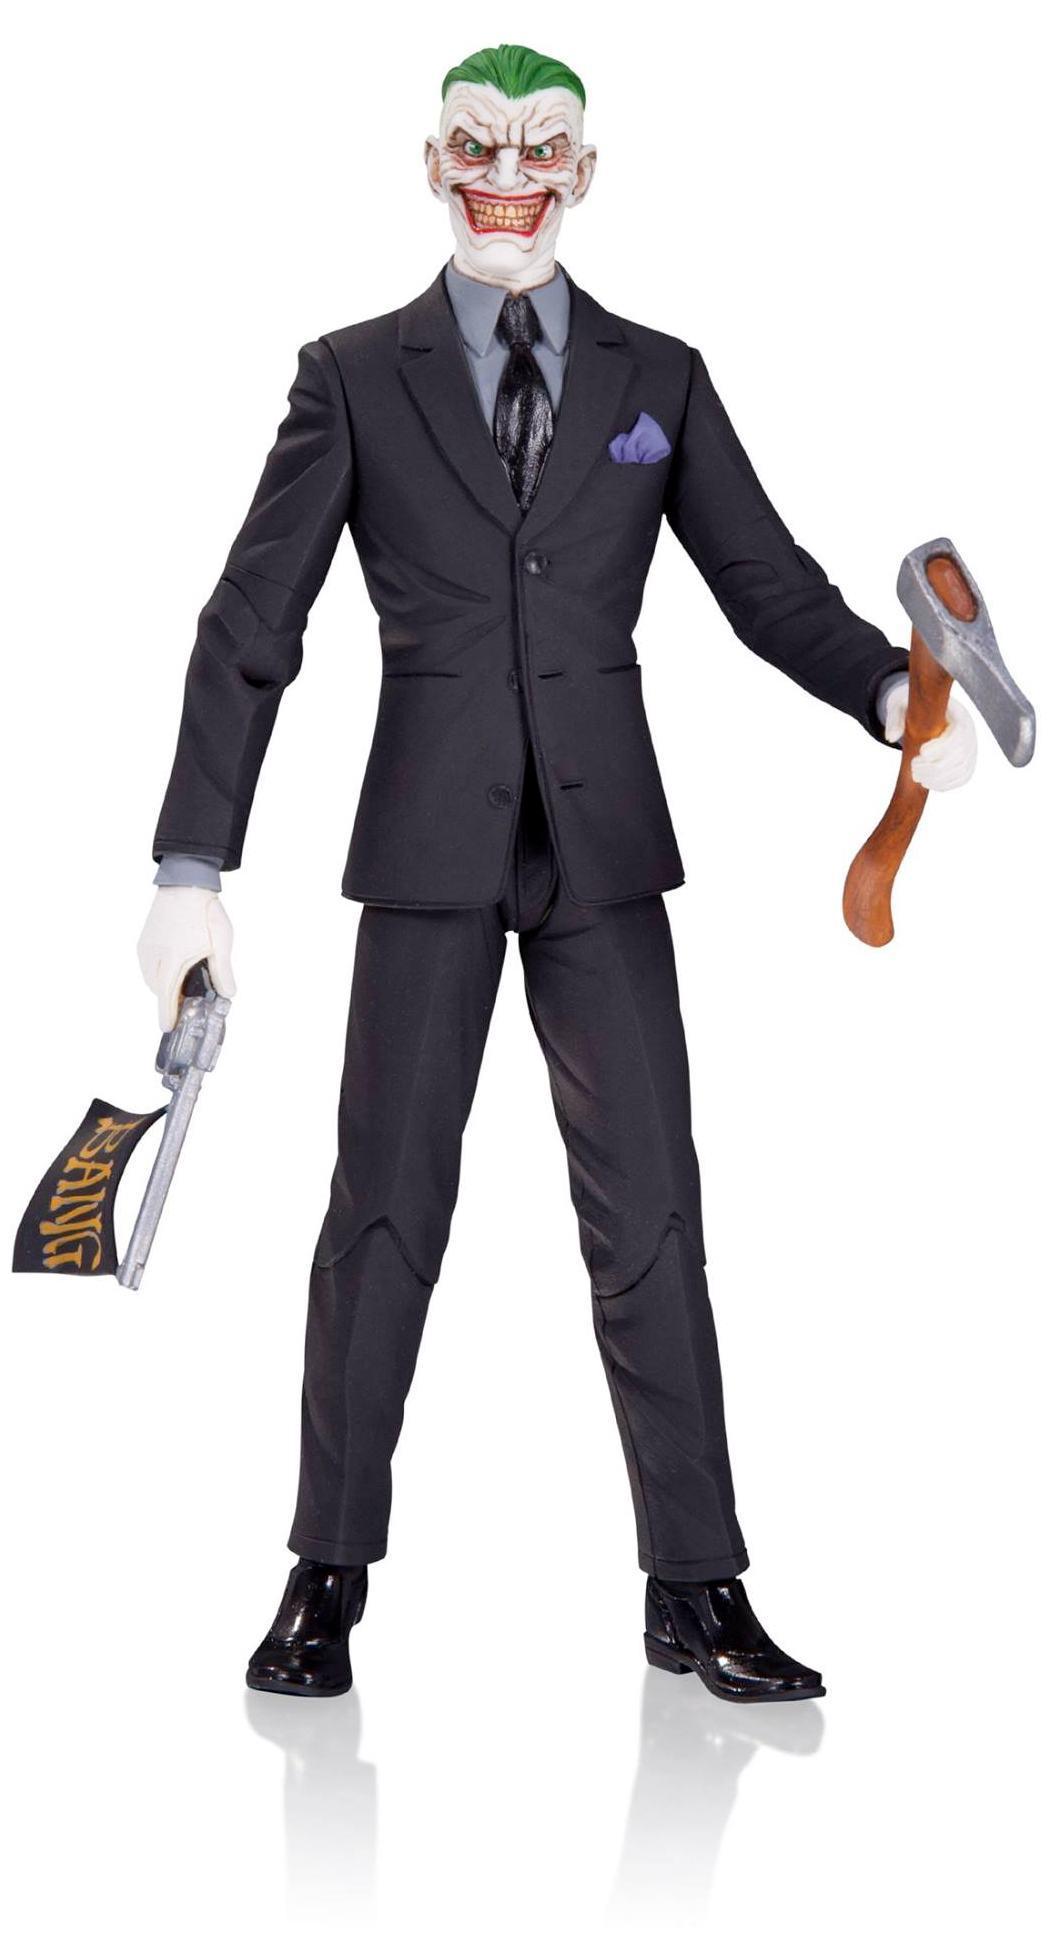 Joker-by-Greg-Capullo-DC-Comics-Designer-Series-Action-Figure-02